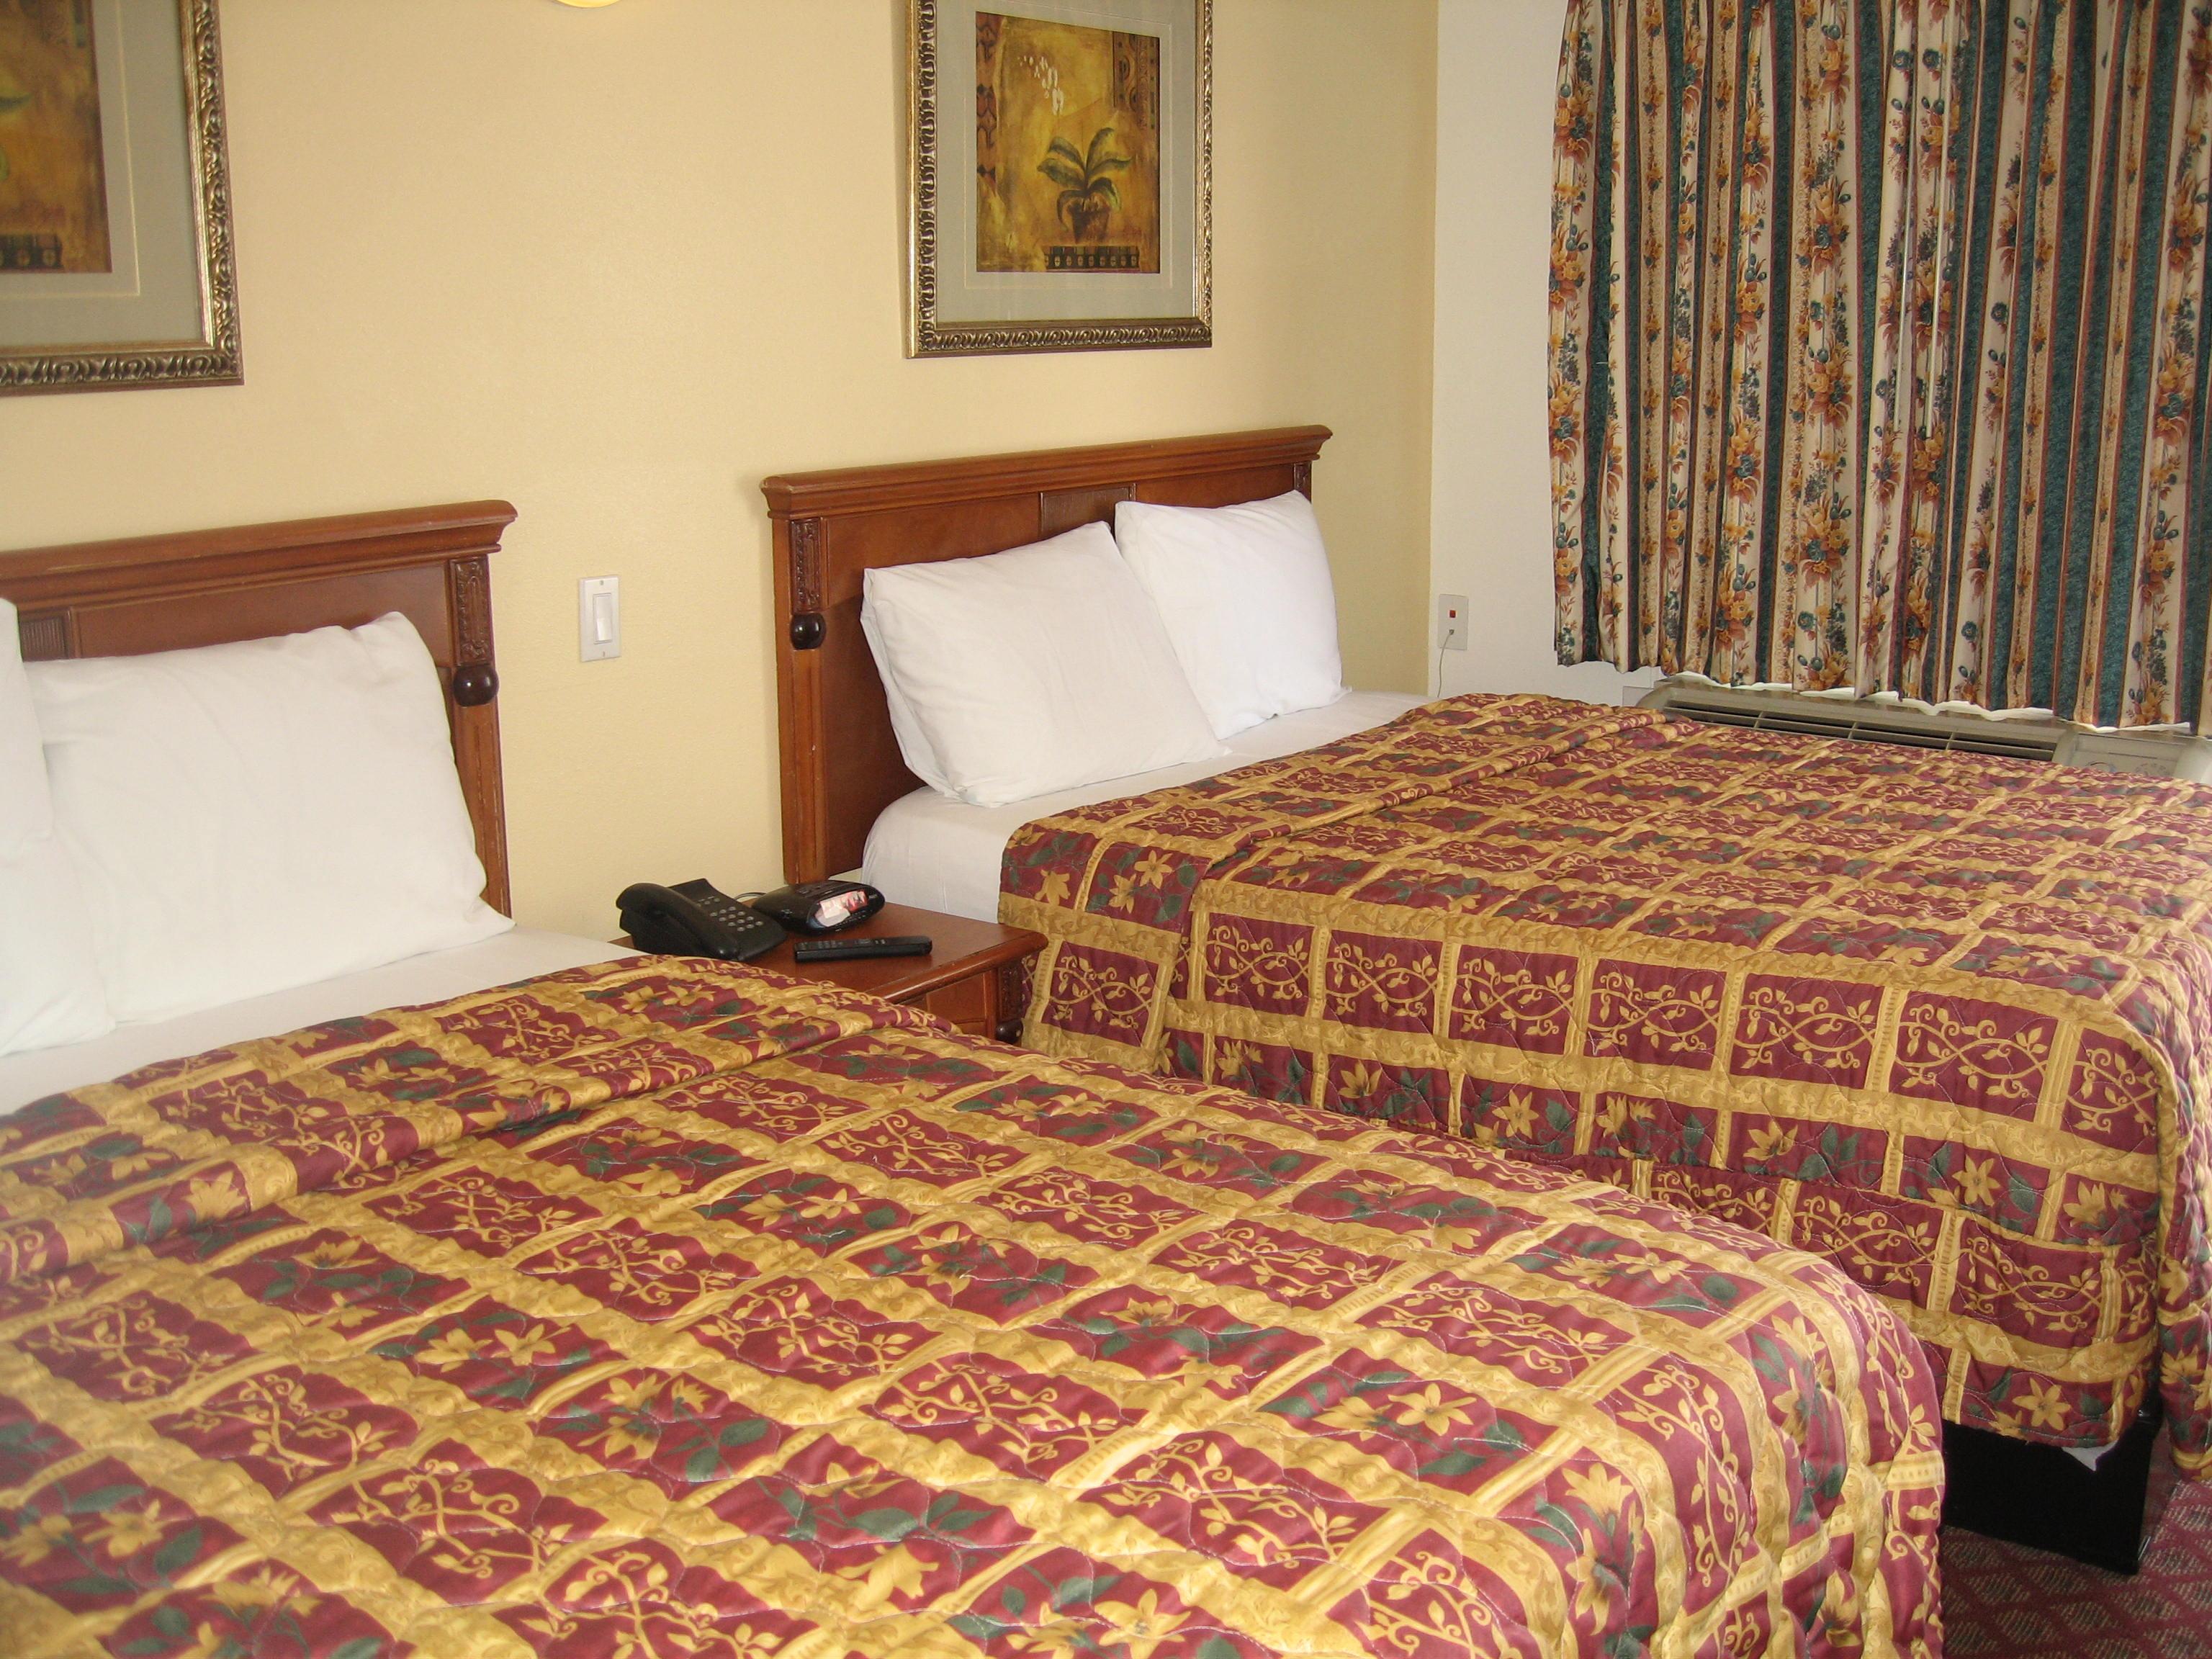 New Motel Pic 029_20140925-08092835.jpg